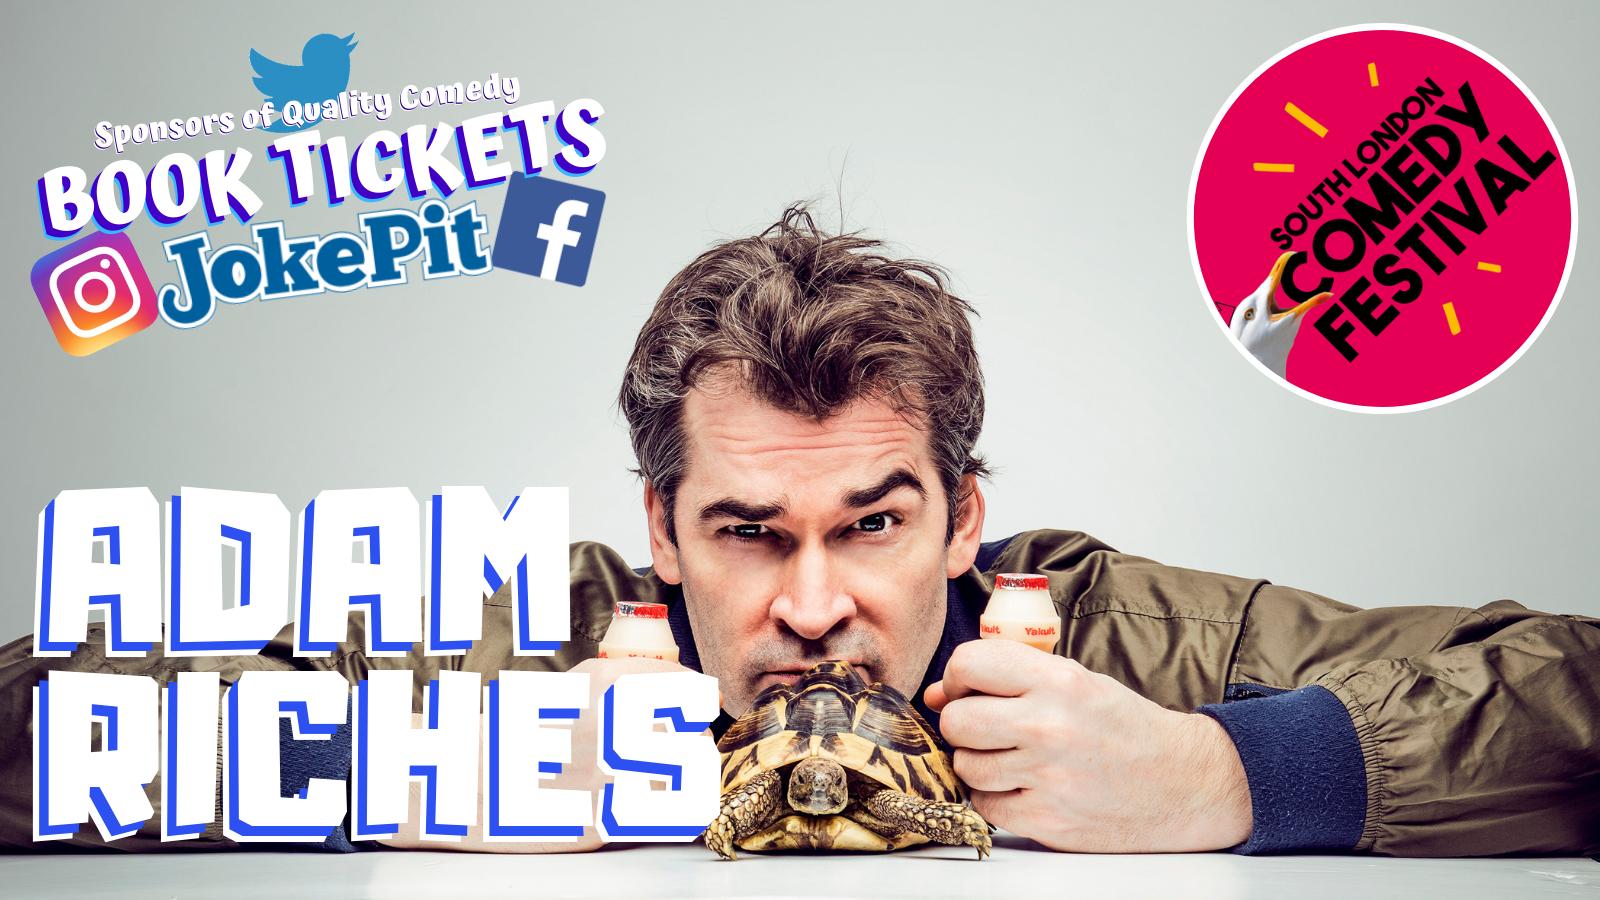 Adam riches jokepit comedy tickets